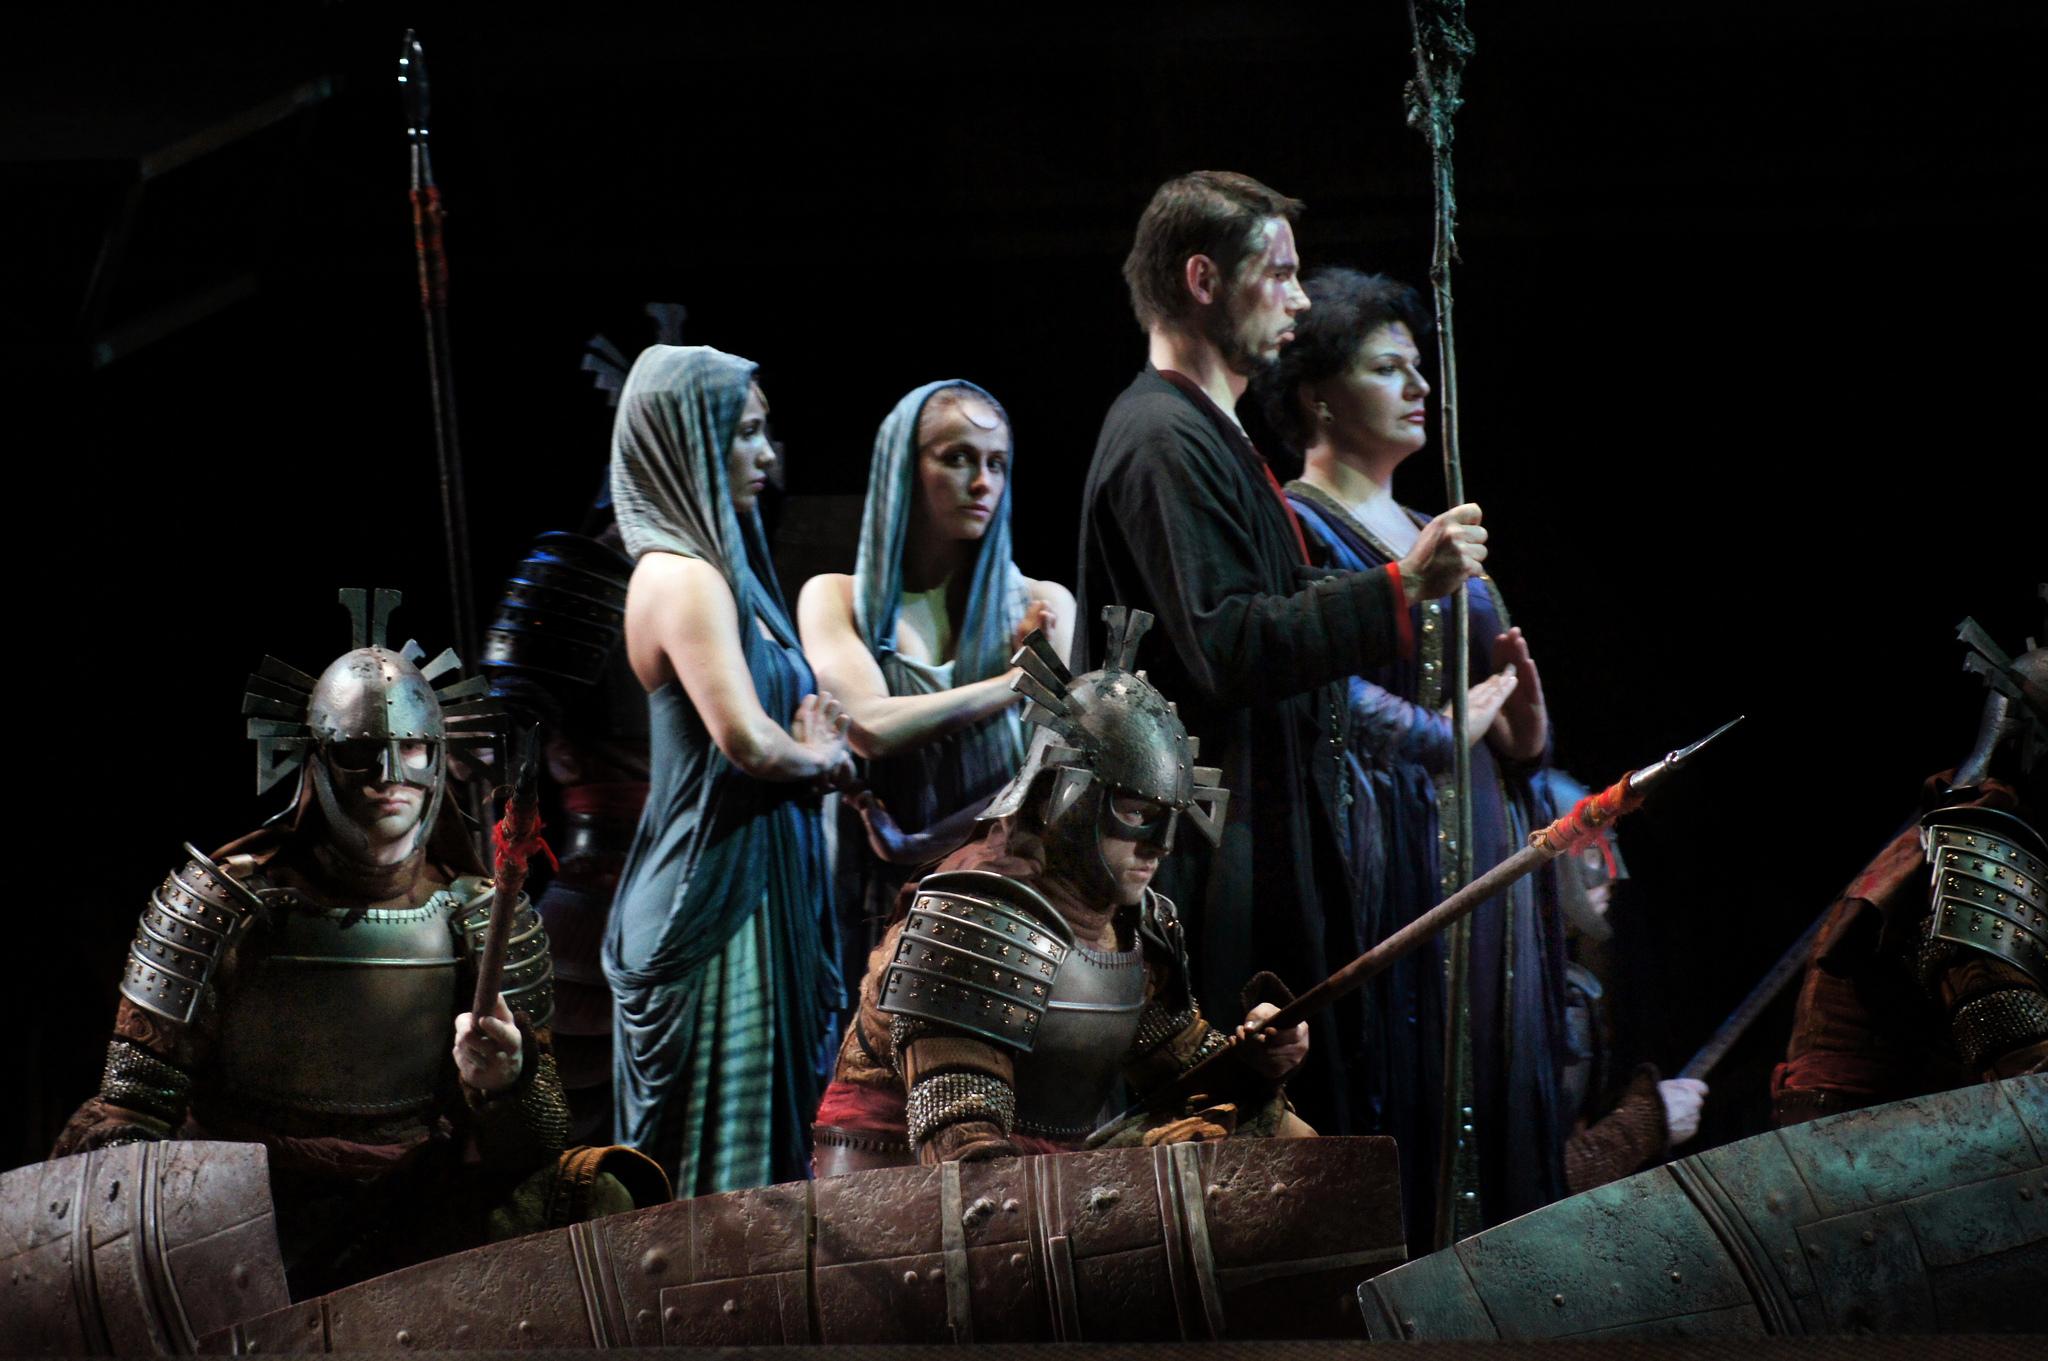 La ópera Aida de Verdi, en el Teatro Real de Madrid